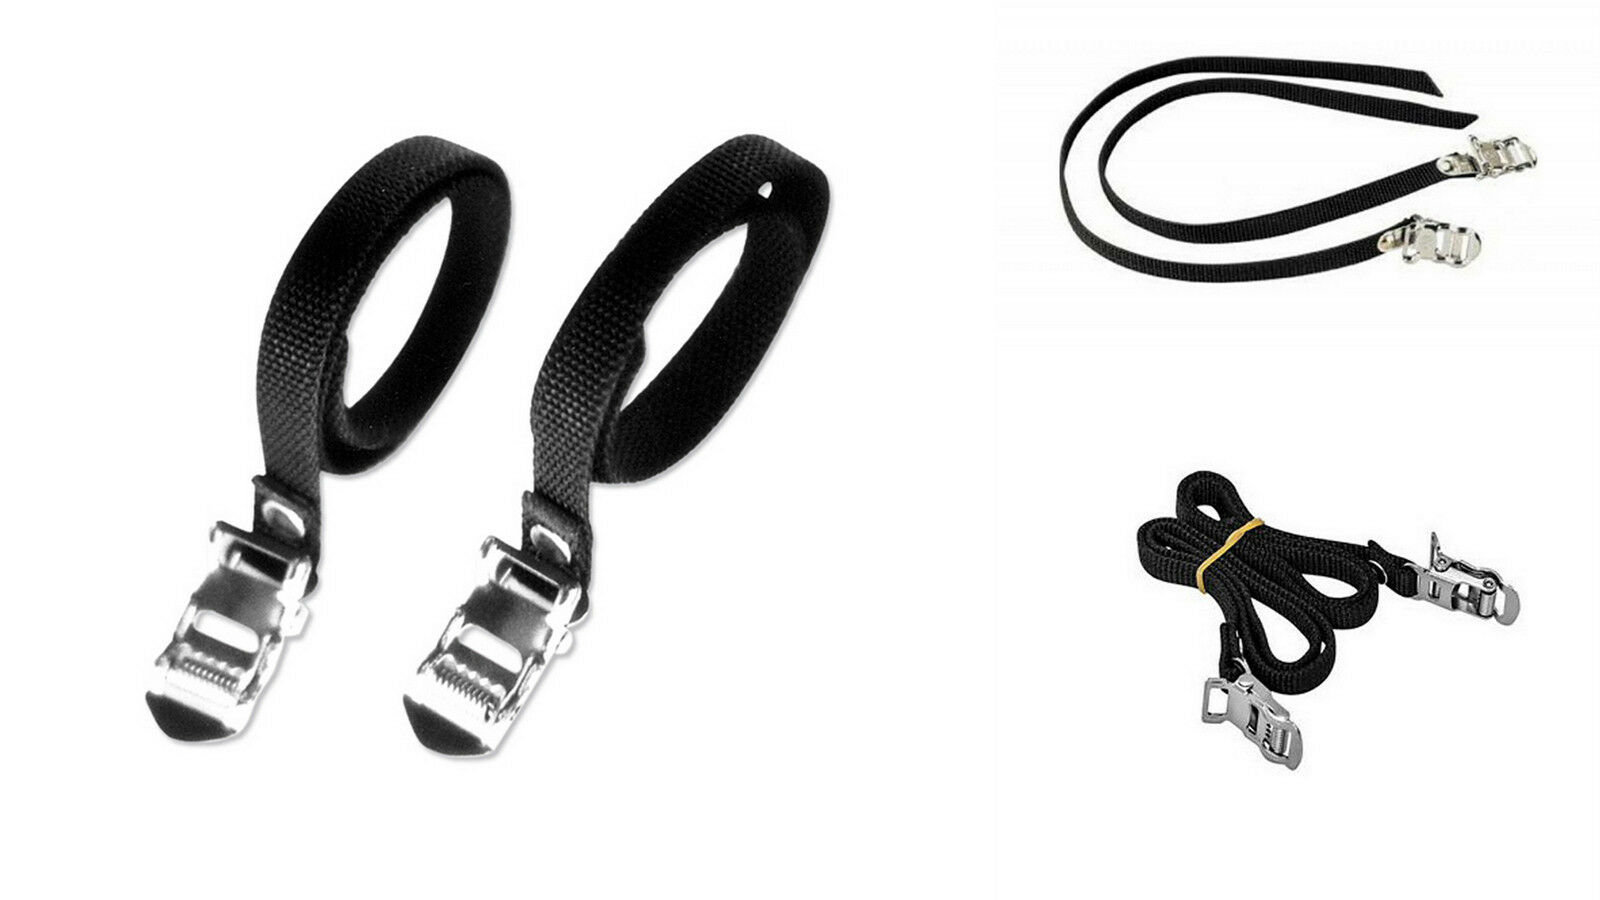 2x Correas Color Negro de Nylon para Calapie Calapies de Bicicleta Vintage 2909